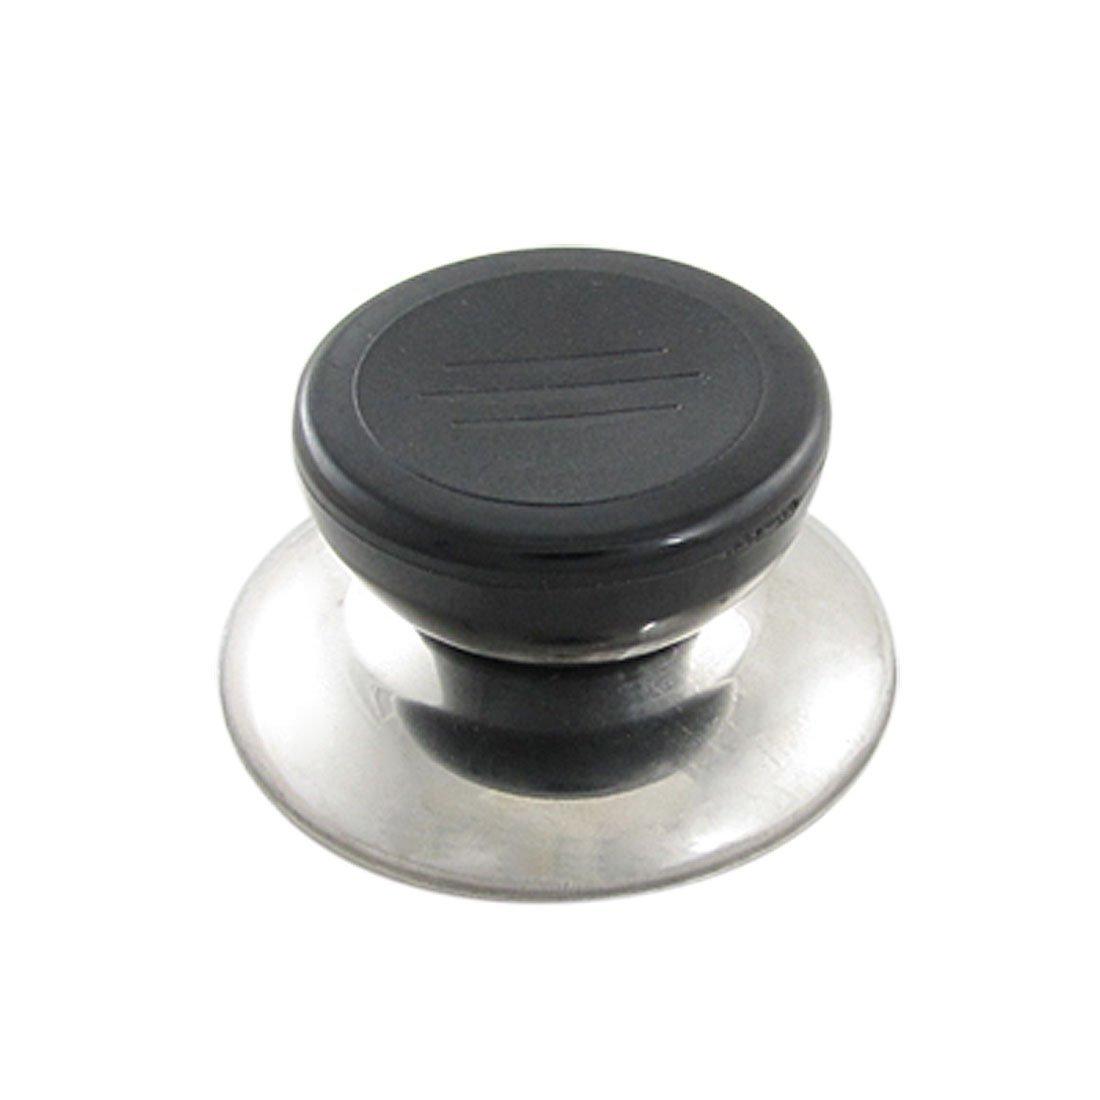 uxcell Kitchen Cooker Pan Pot Kettle Lids Knob Replacement a11031700ux0297